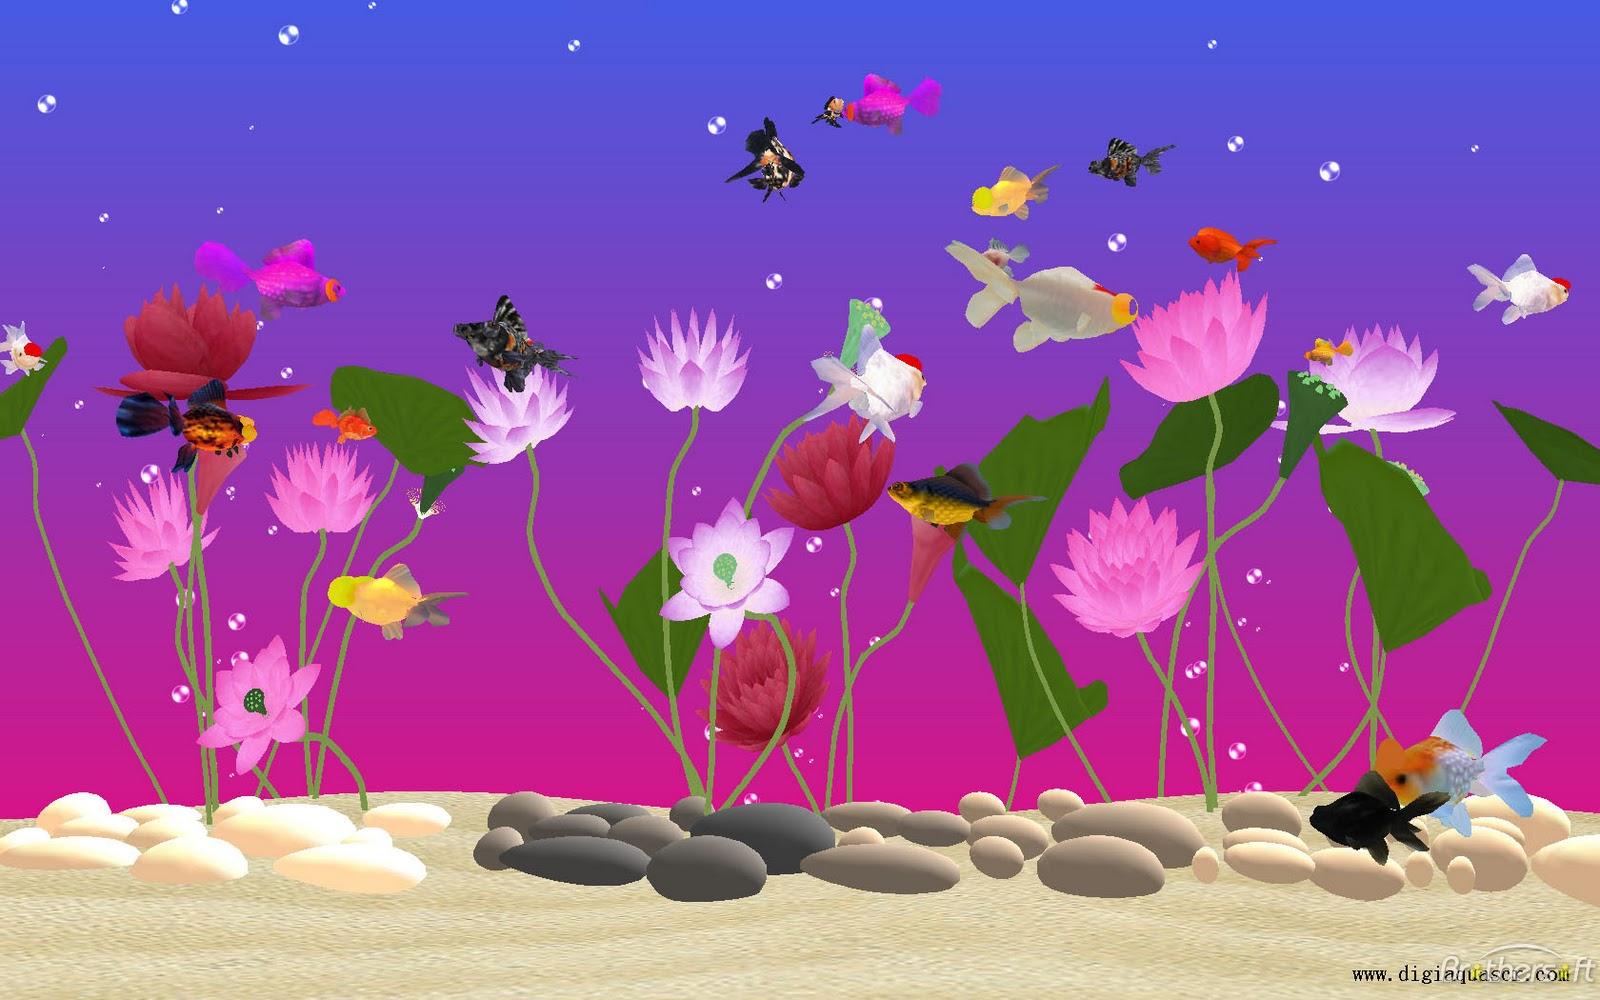 48 Most Popular Wallpapers For Desktop On Wallpapersafari: Animated Goldfish Wallpaper And Screensaver